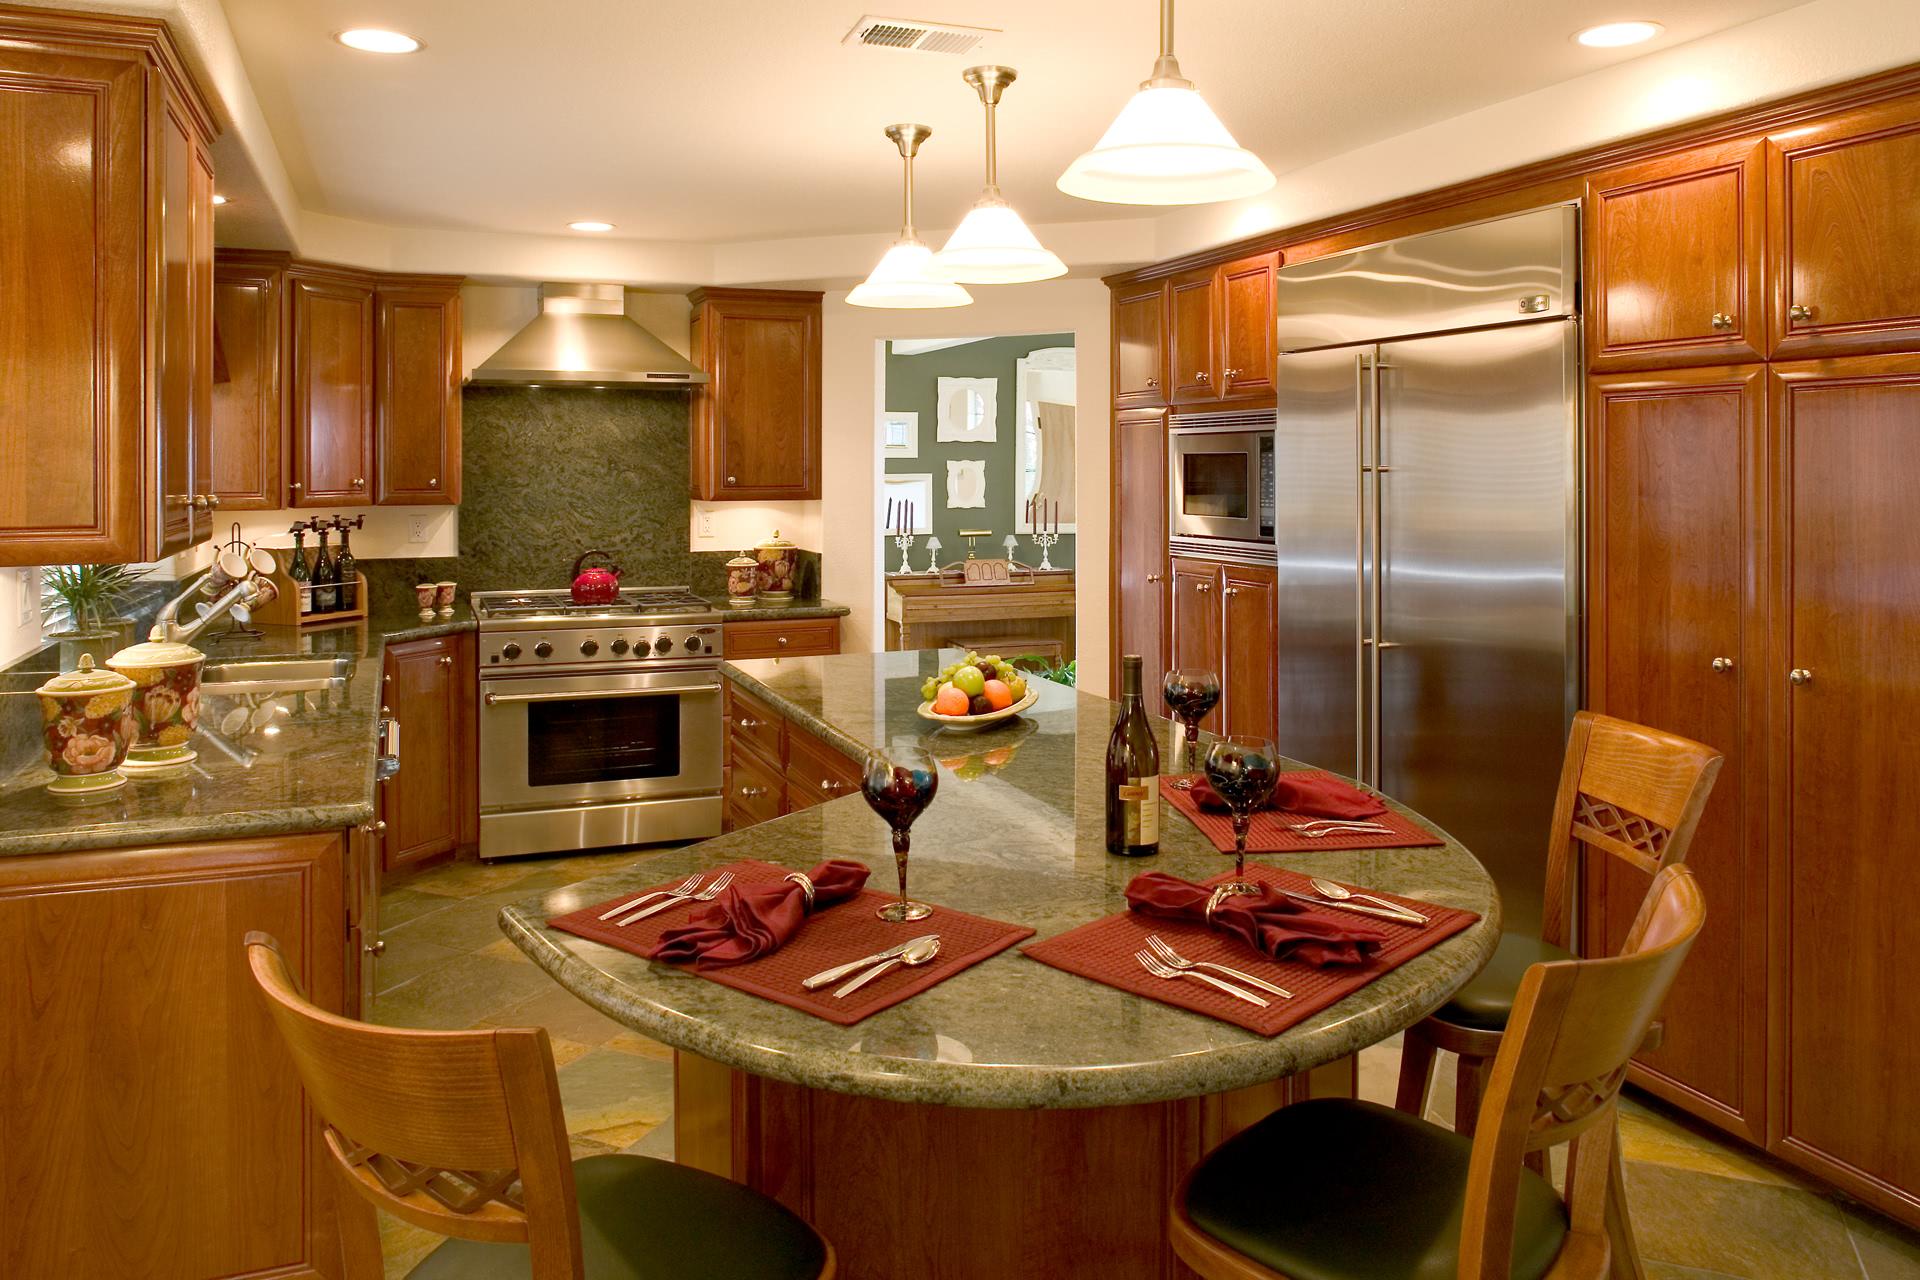 Custom Kitchen Peninsula With Butcher Block Countertop